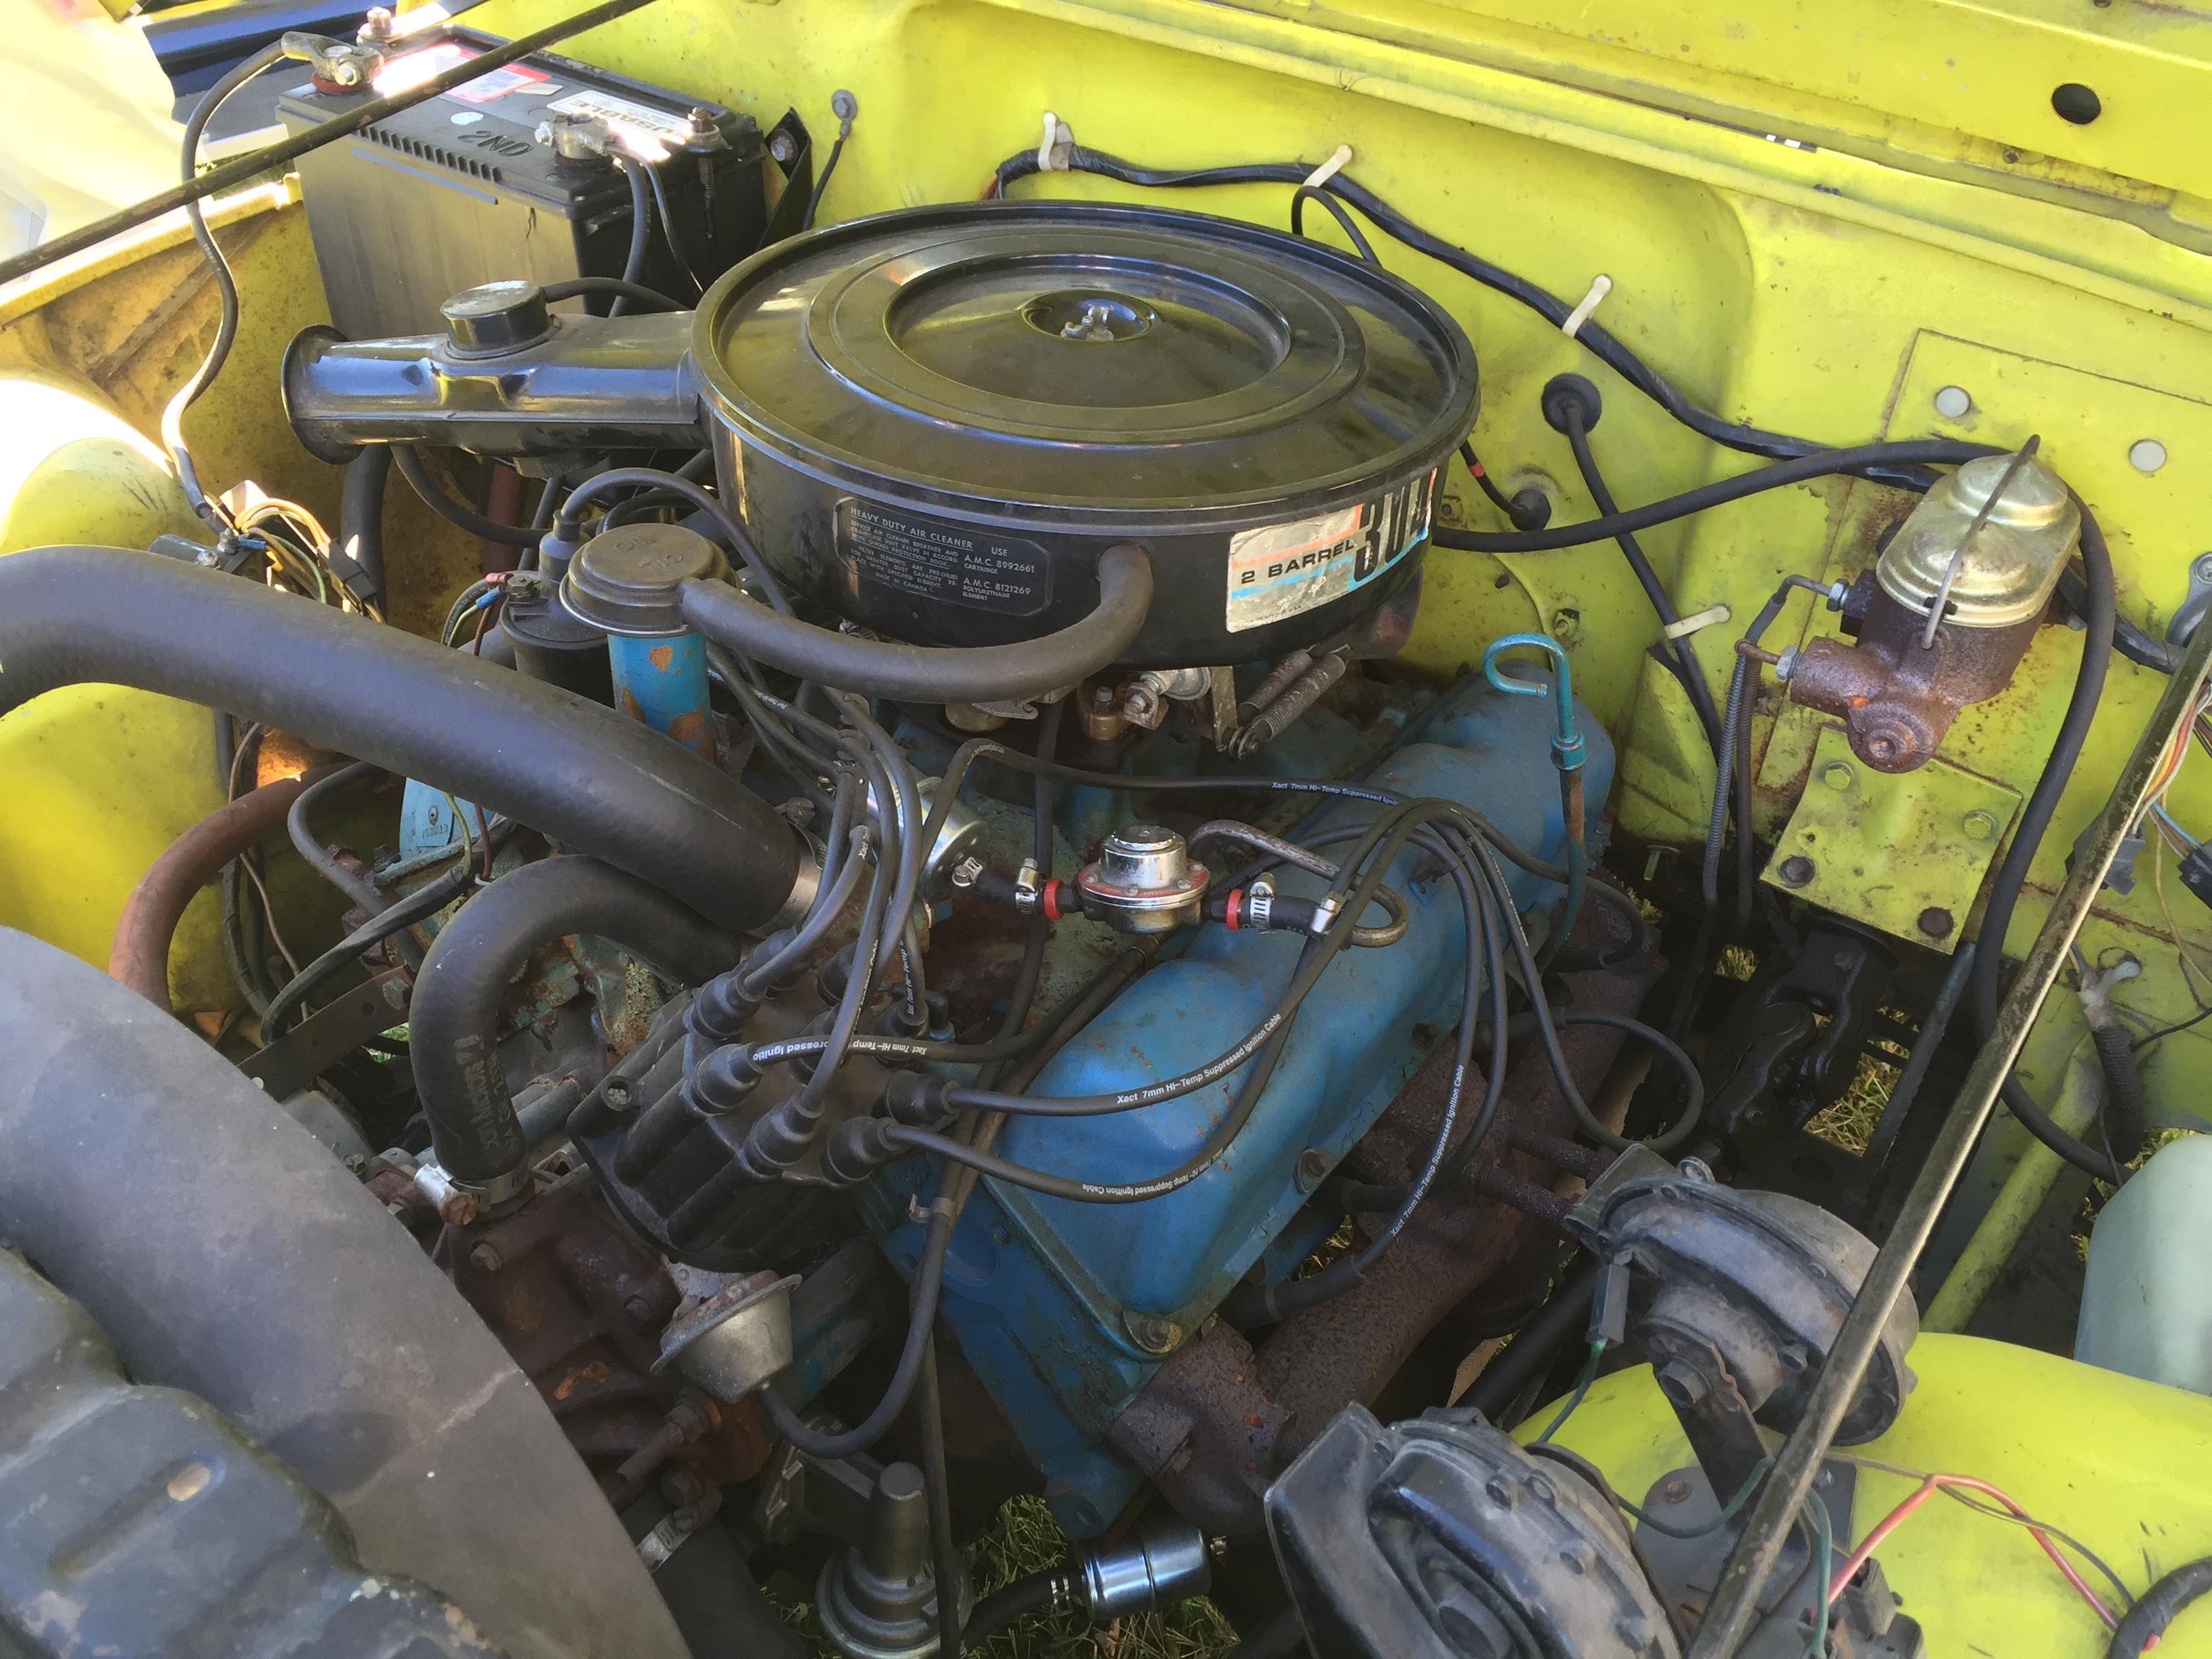 1979 Jeep 304 Wiring Harness Schematic Diagrams Cj Amc Engine Fuel Lines U2022 Diagram